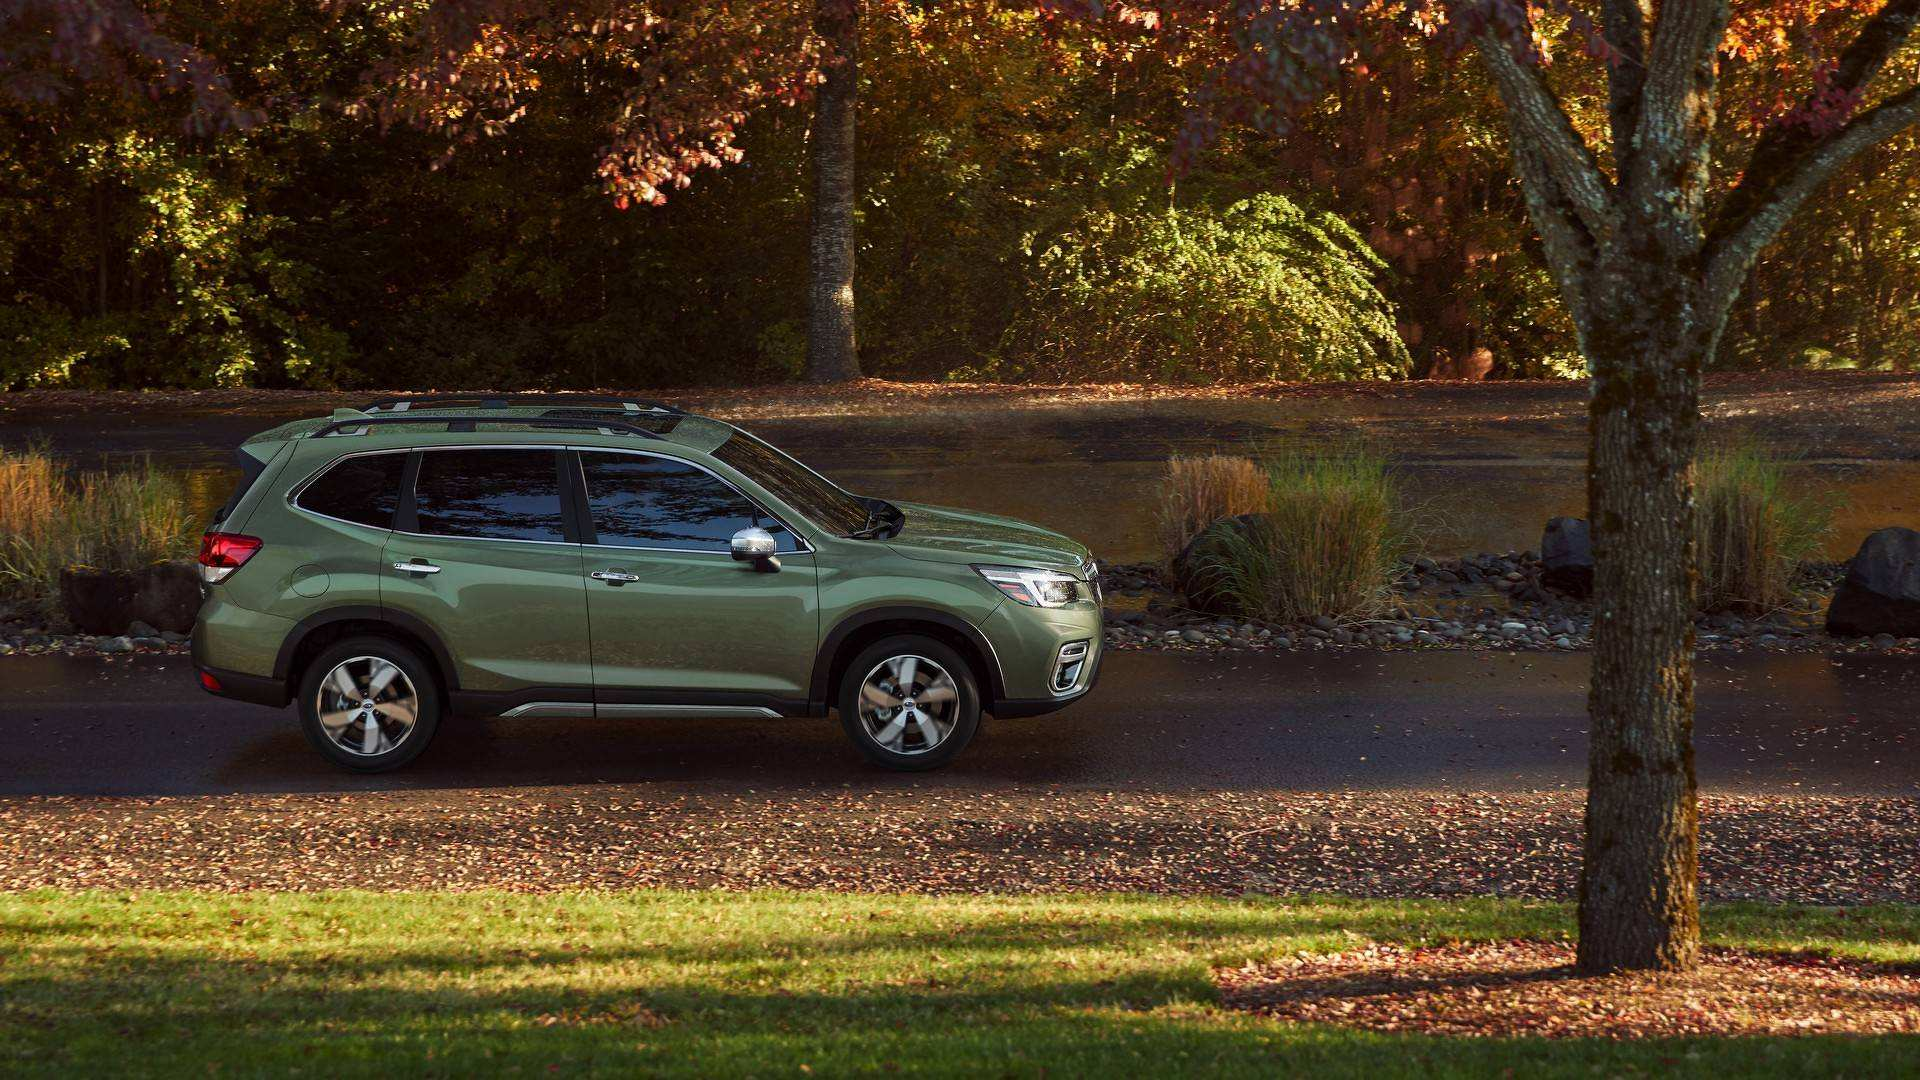 31 Great Subaru Forester 2019 Green Spy Shoot Interior for Subaru Forester 2019 Green Spy Shoot